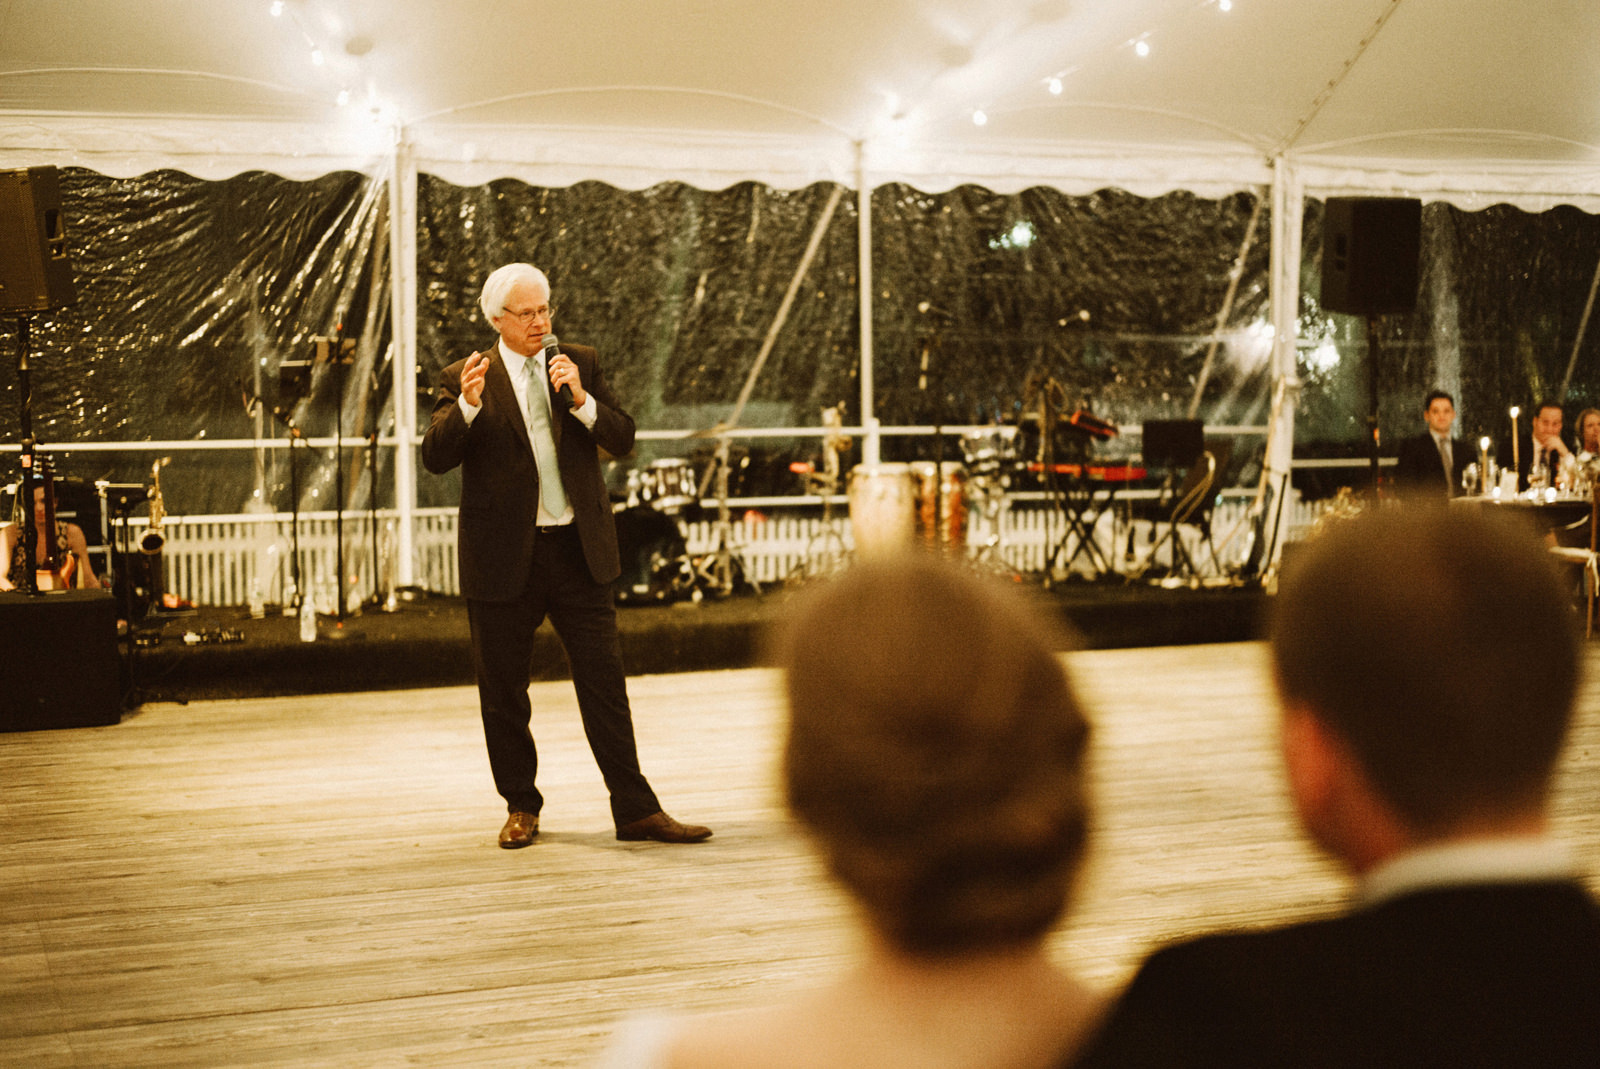 bridgeport-wedding-150 BRIDGEPORT, CONNECTICUT BACKYARD WEDDING